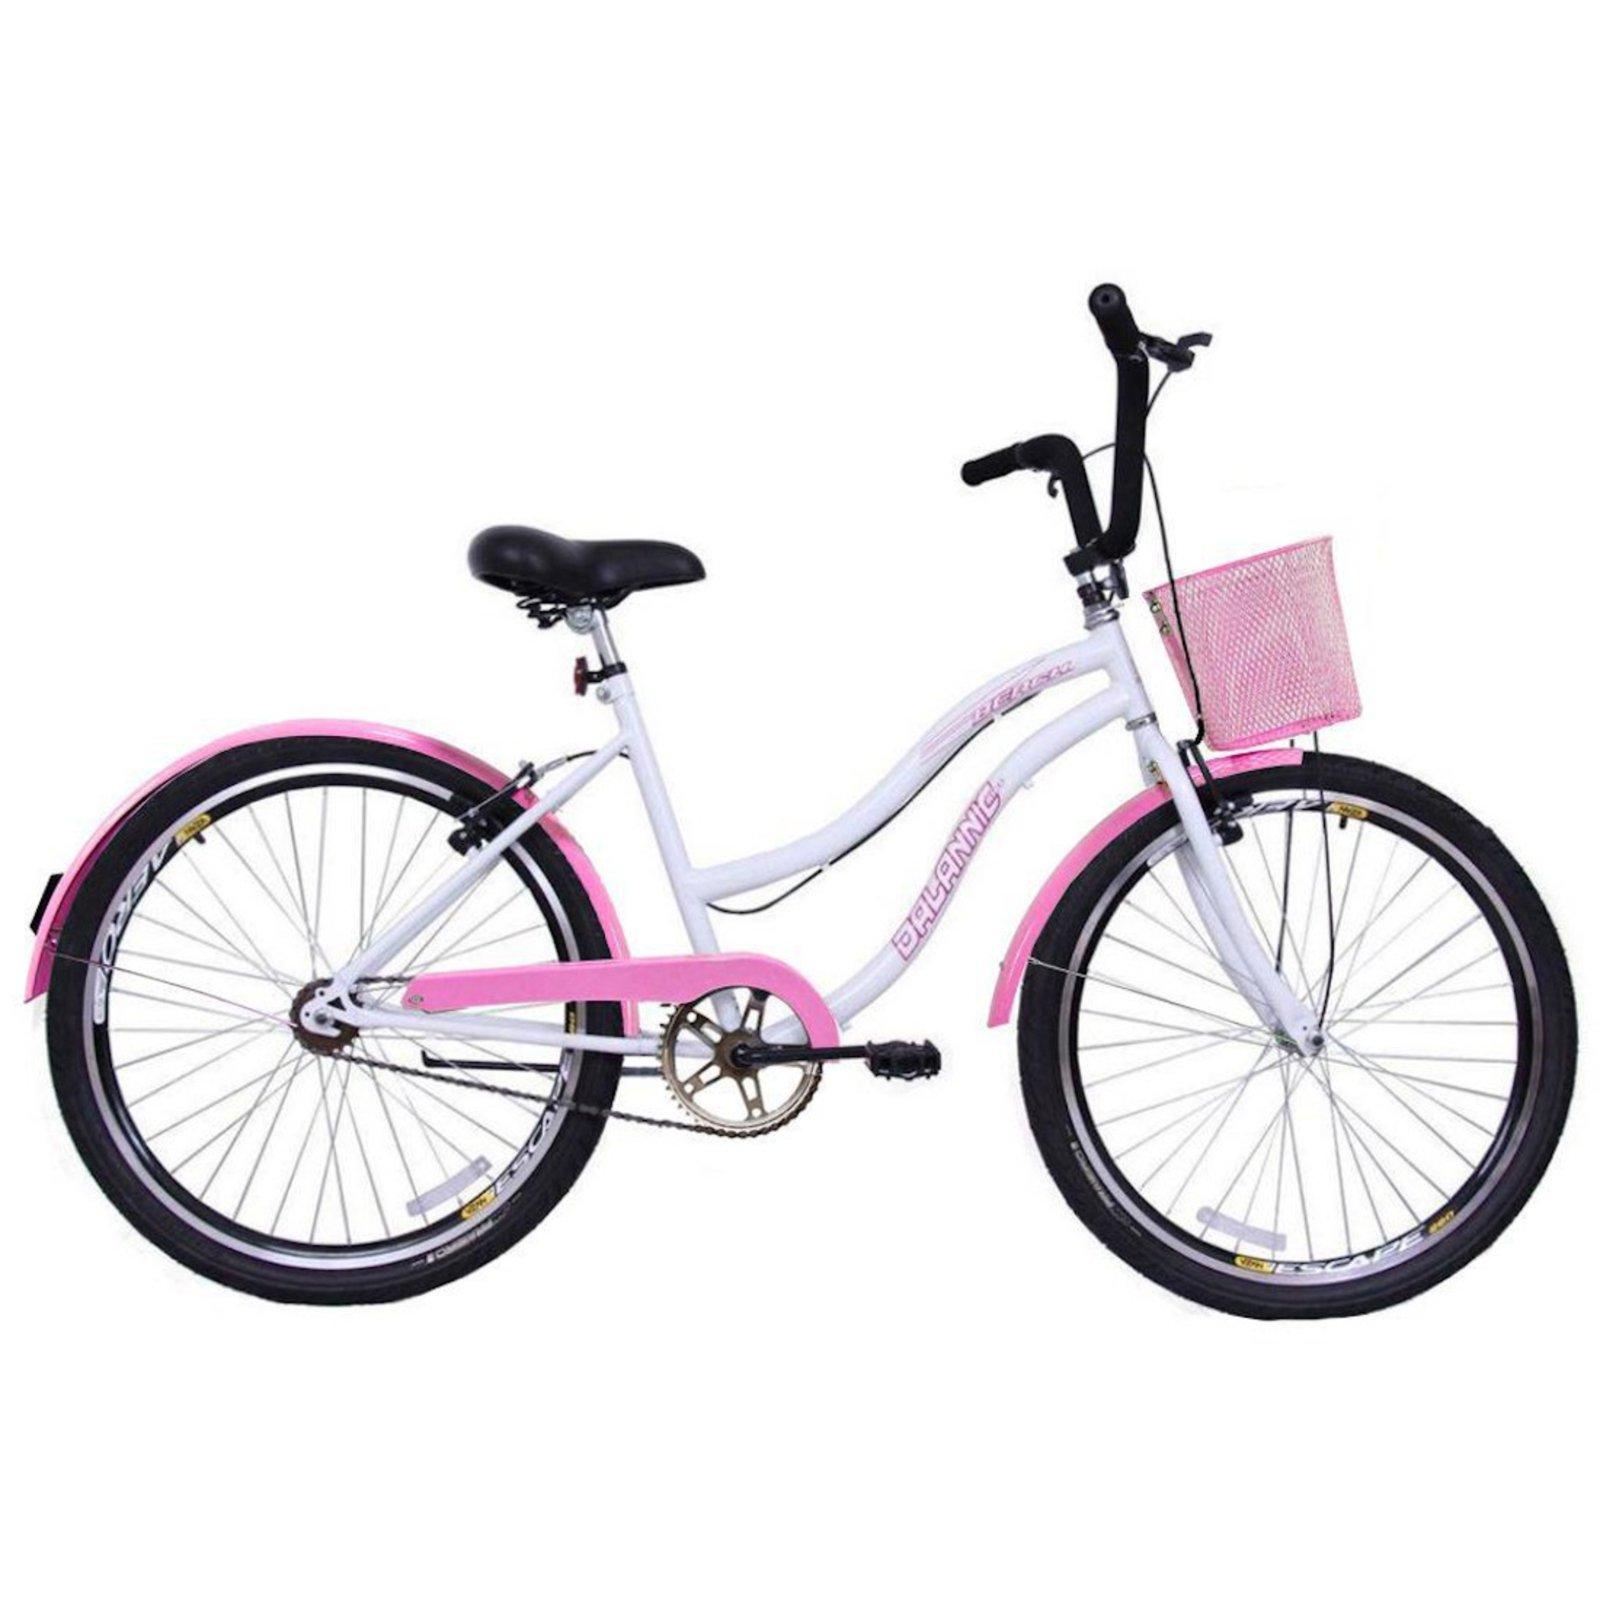 Bicicleta Dalannio Bike Beach Aro 26 Rígida 18 Marchas - Branco/rosa